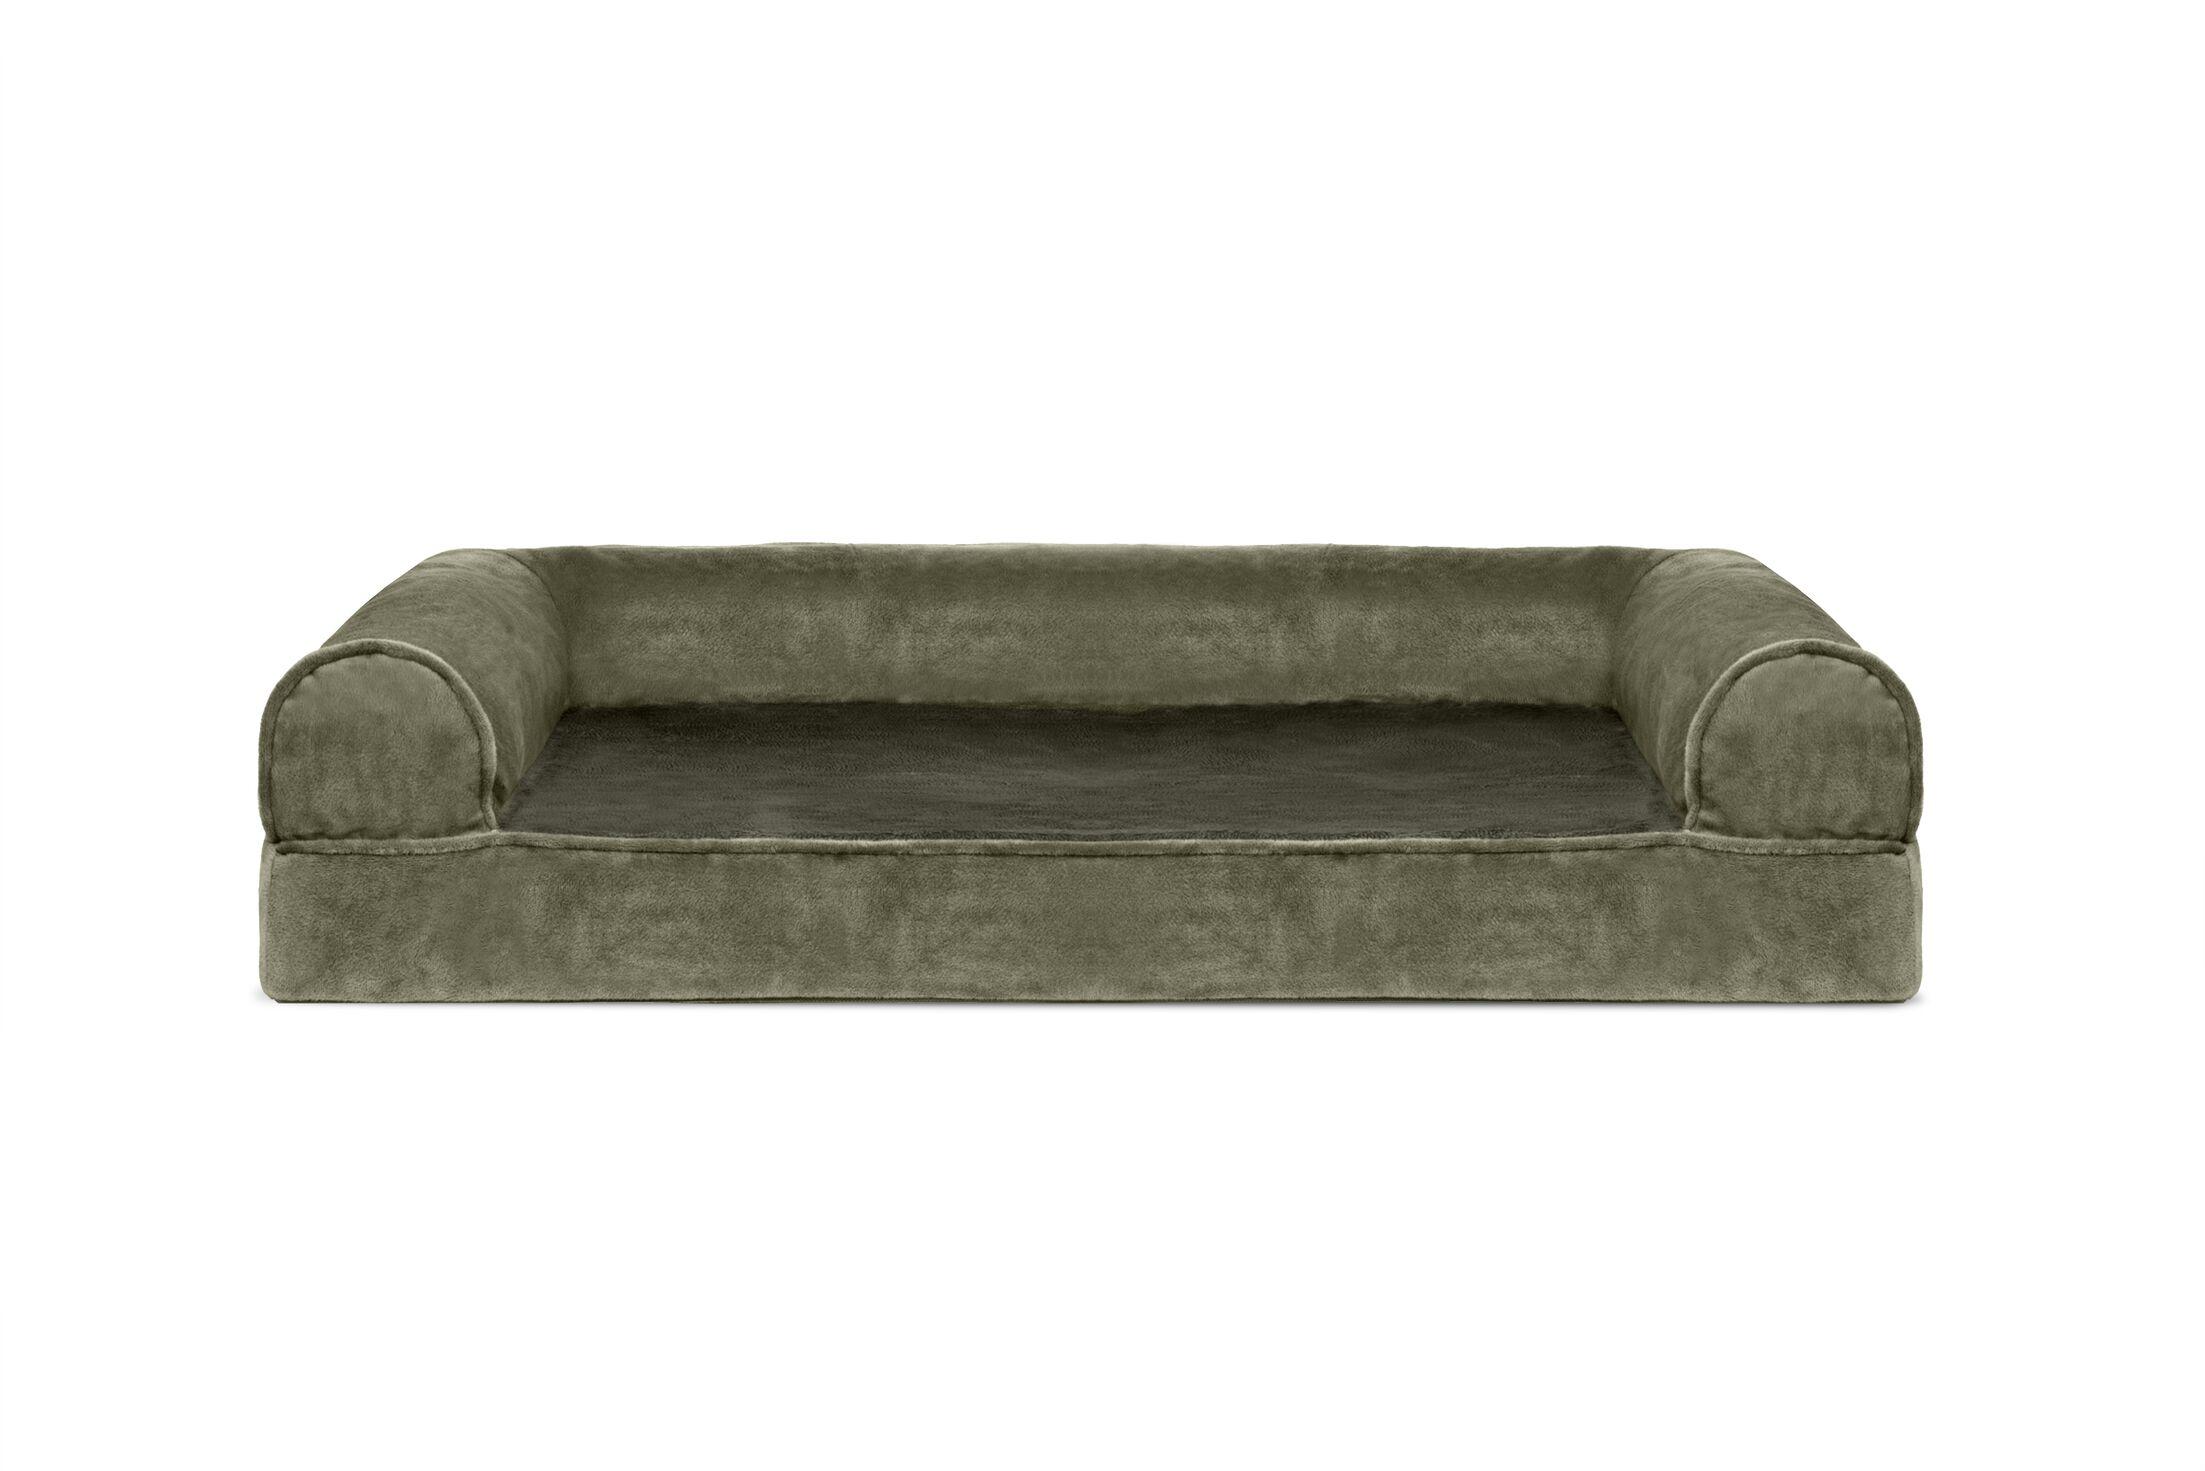 Caddy Faux Fur and Velvet Orthopedic Dog Sofa Color: Dark Sage, Size: Medium (30